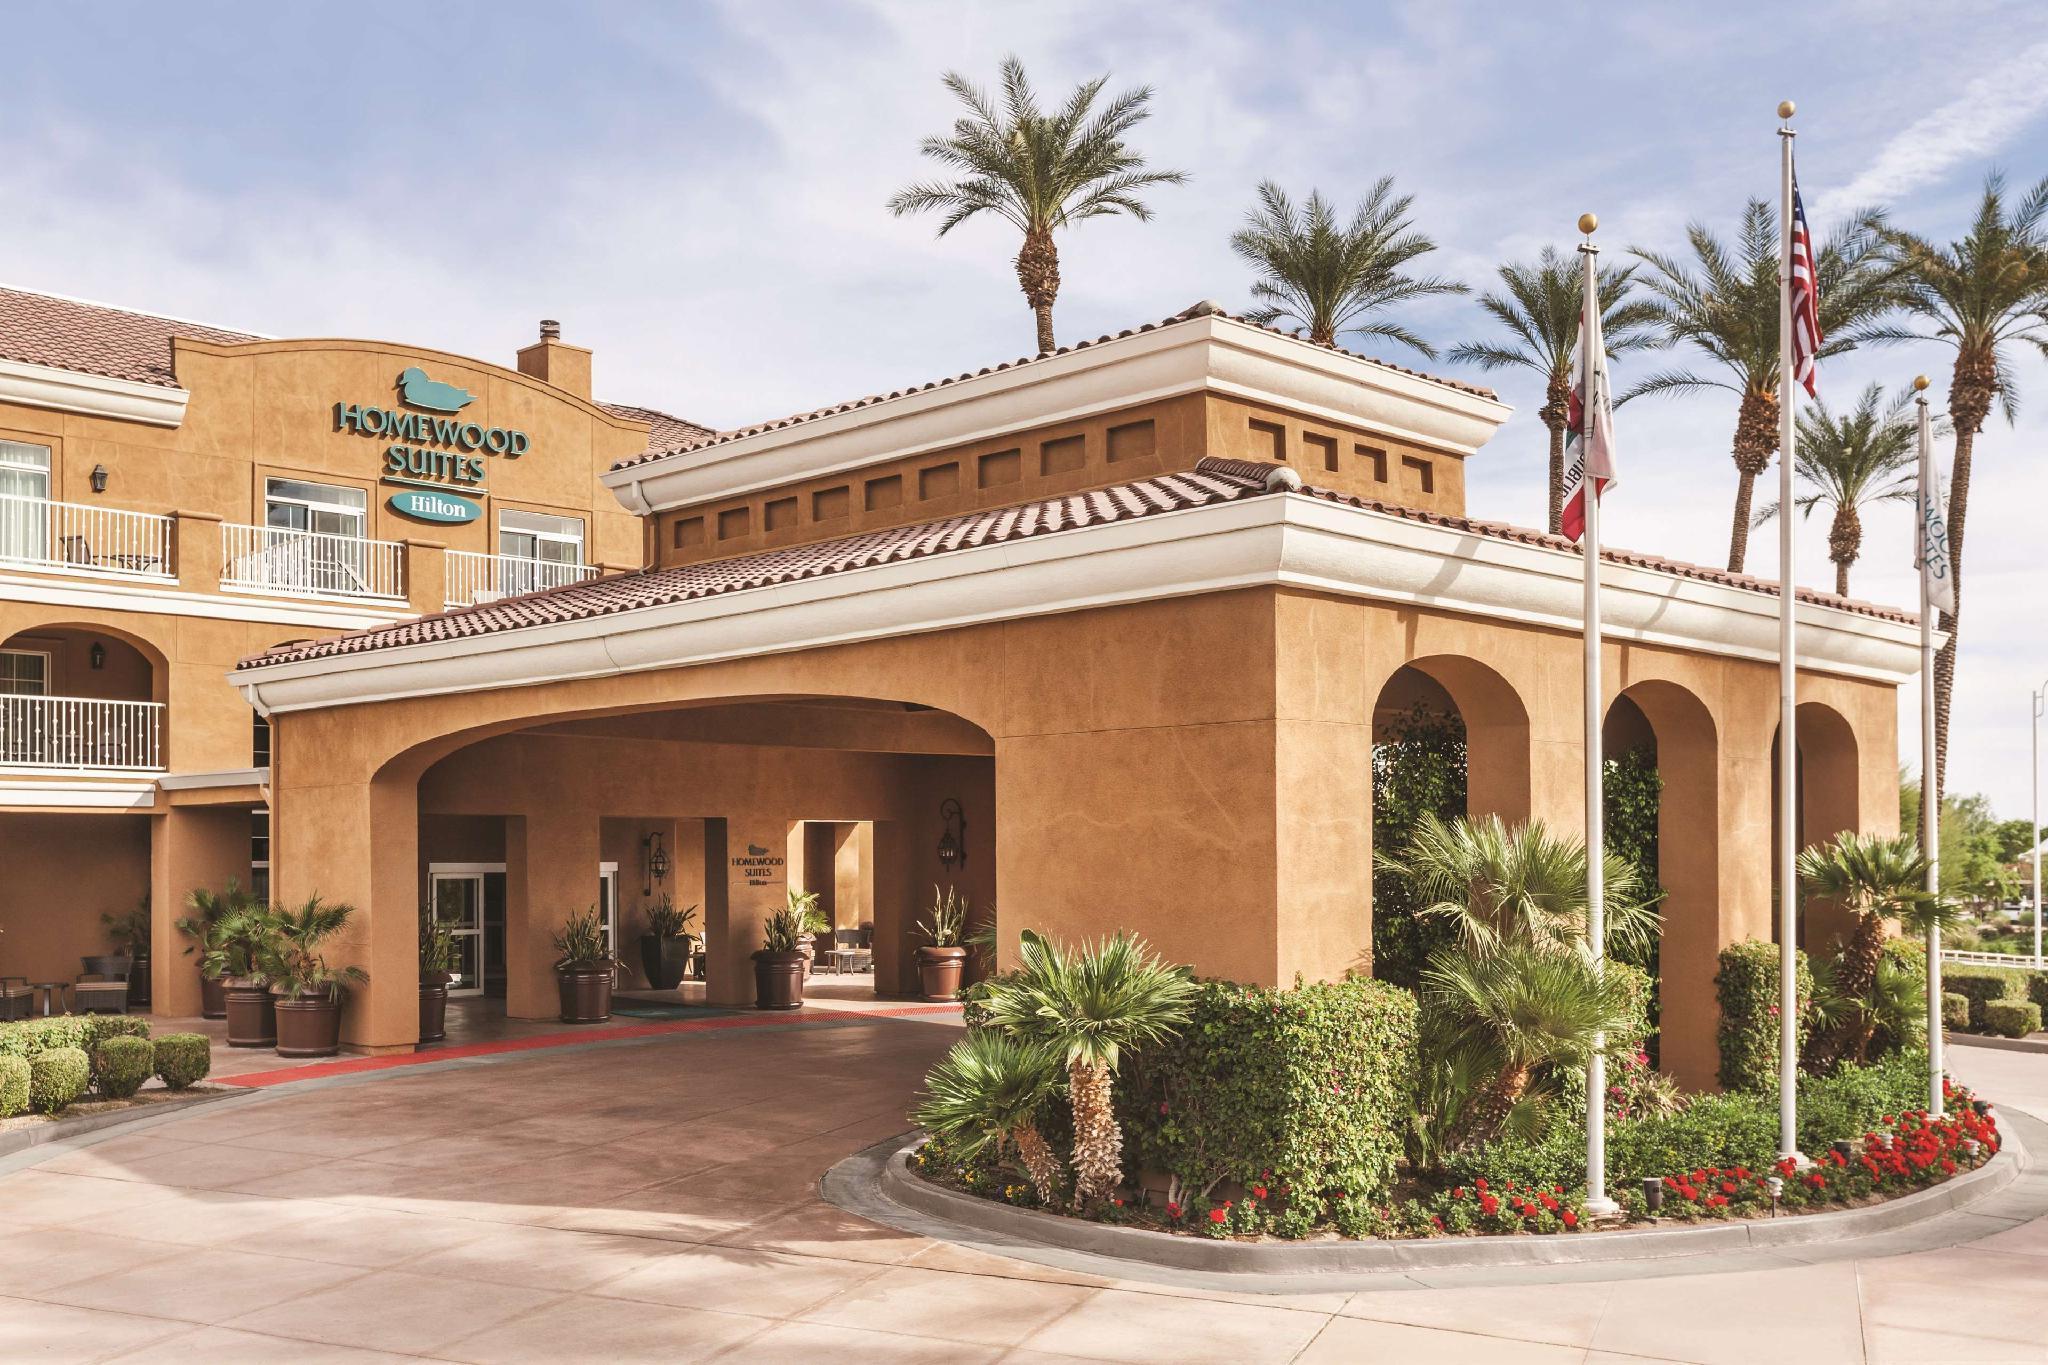 Homewood Suites By Hilton La Quinta CA